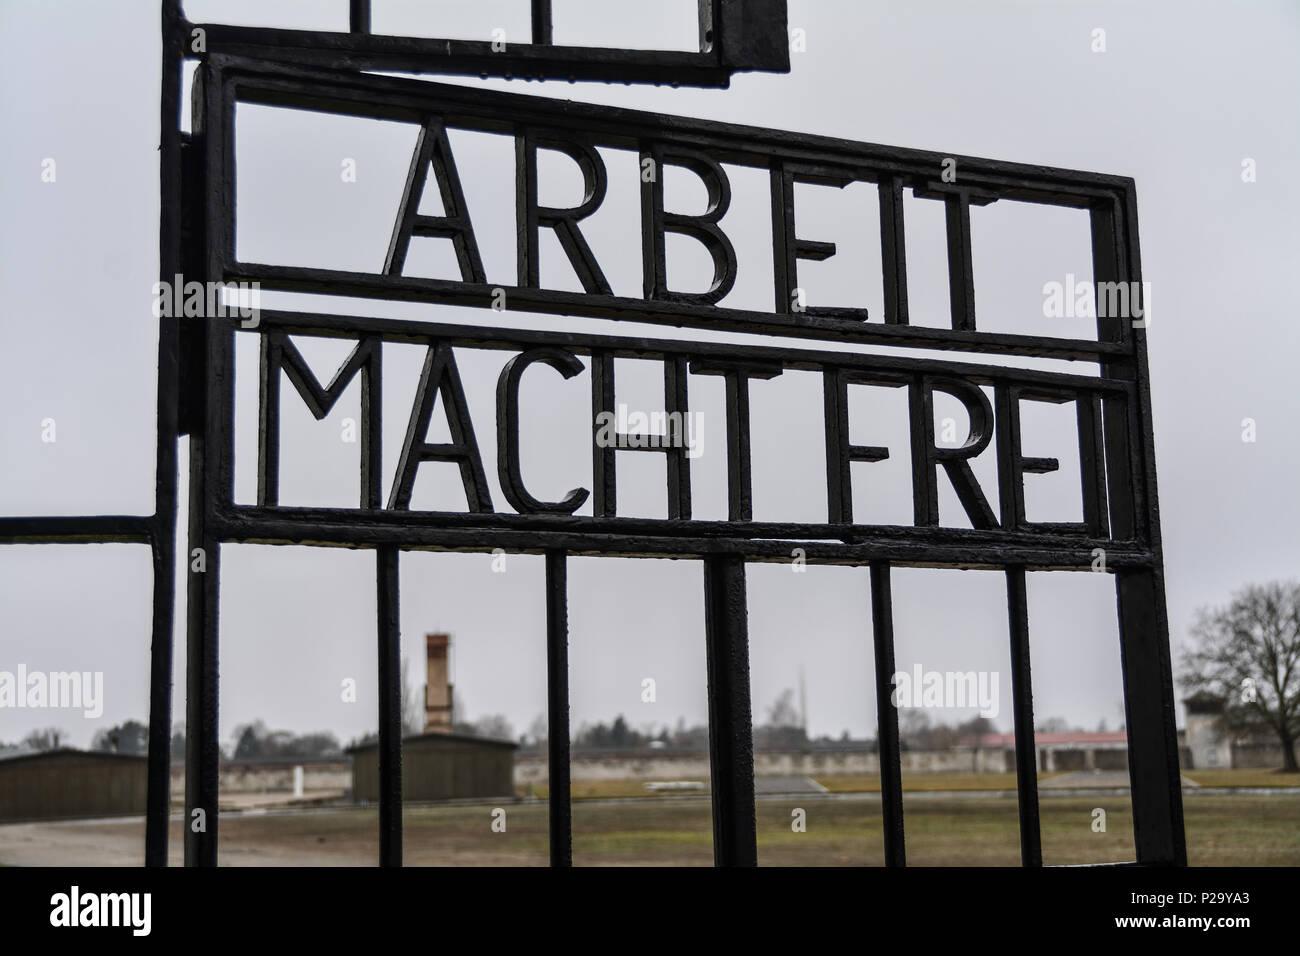 Arbeit Macht Frei on the gate of Sachsenhausen, Germany - Stock Image